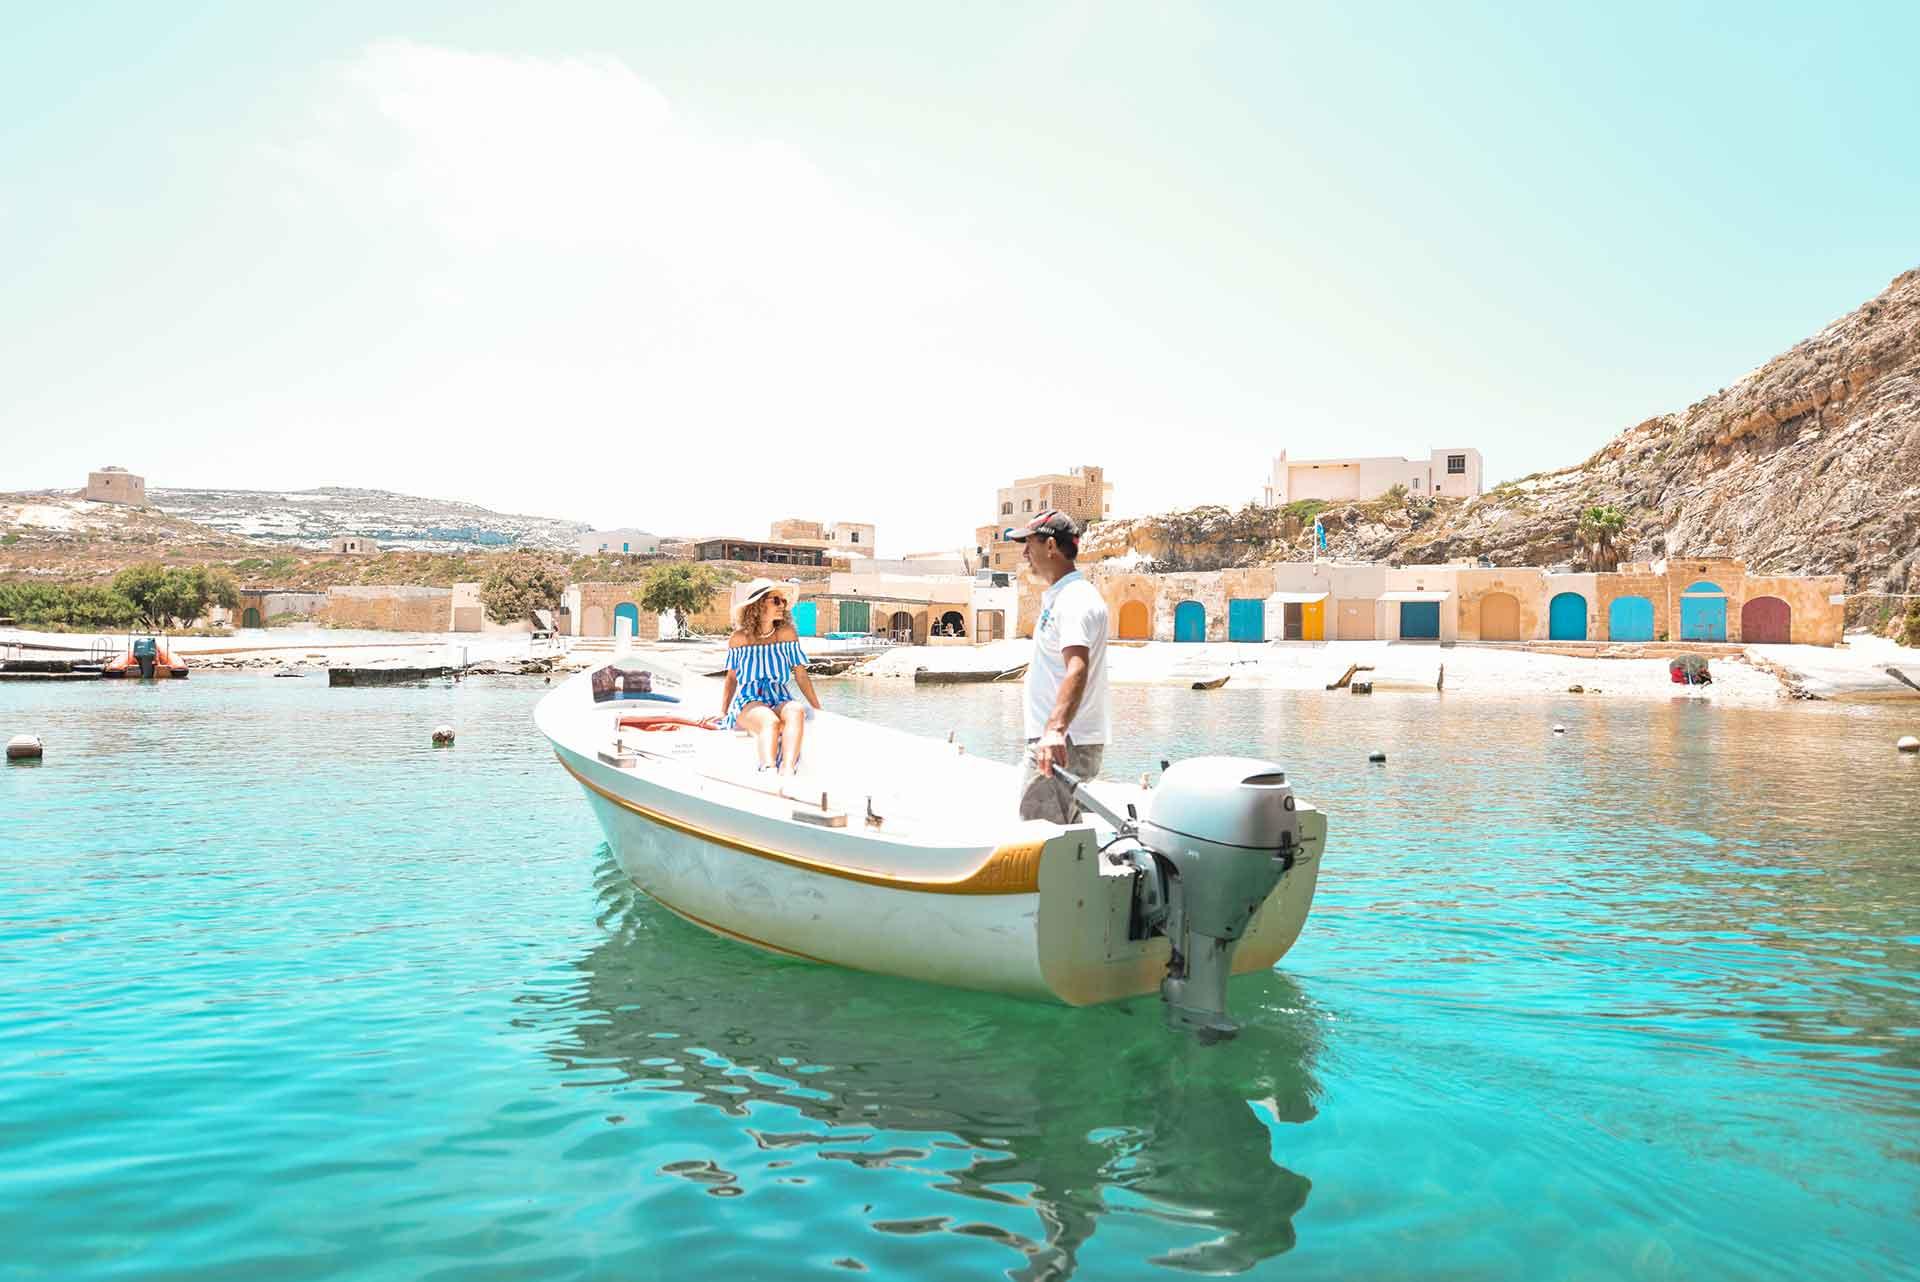 Boatride-at-the-Inland-Sea